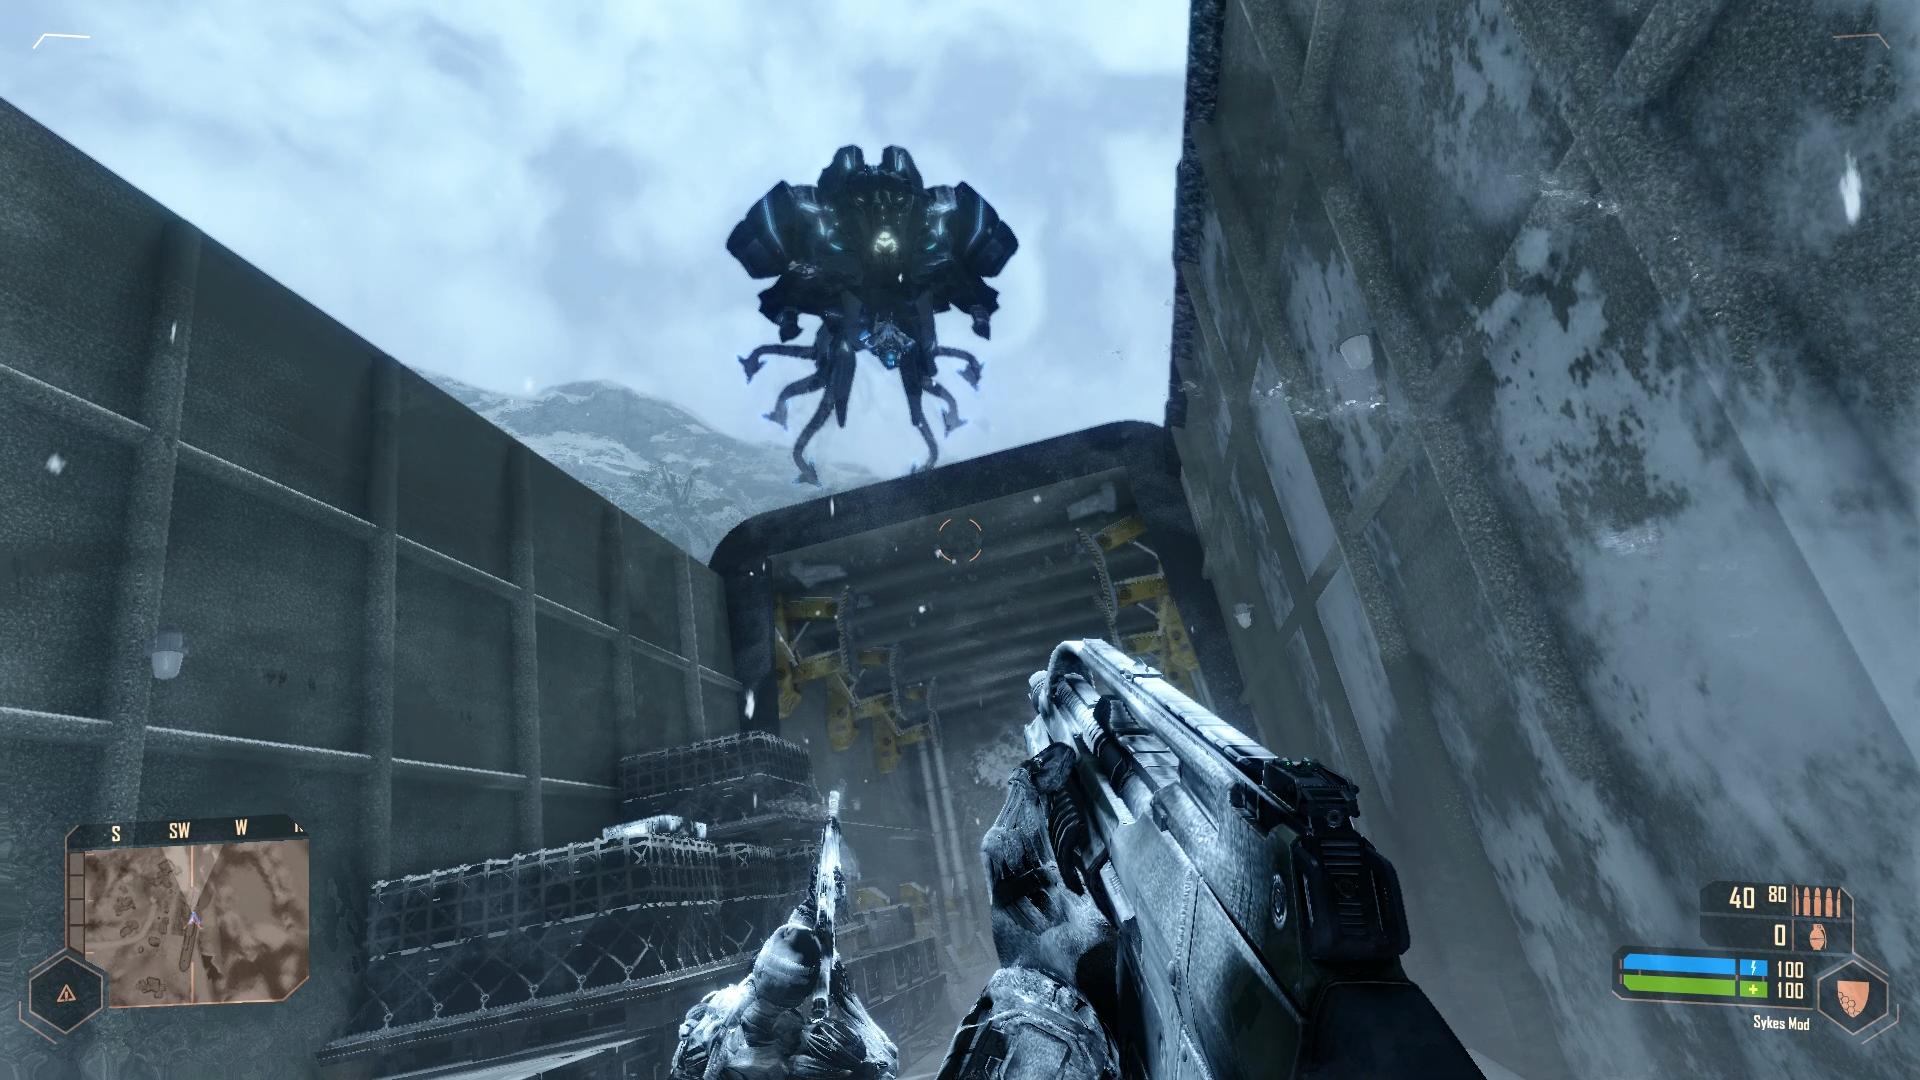 Crysis Co-op